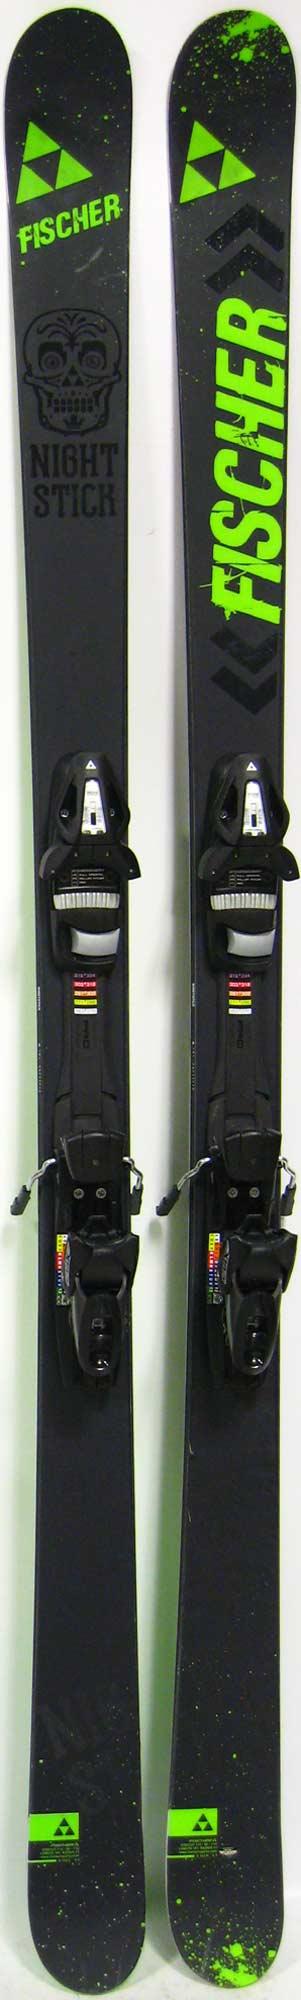 9d8ea08040 2014 Fischer Nightstick 181cm Used Demo Skis on Sale